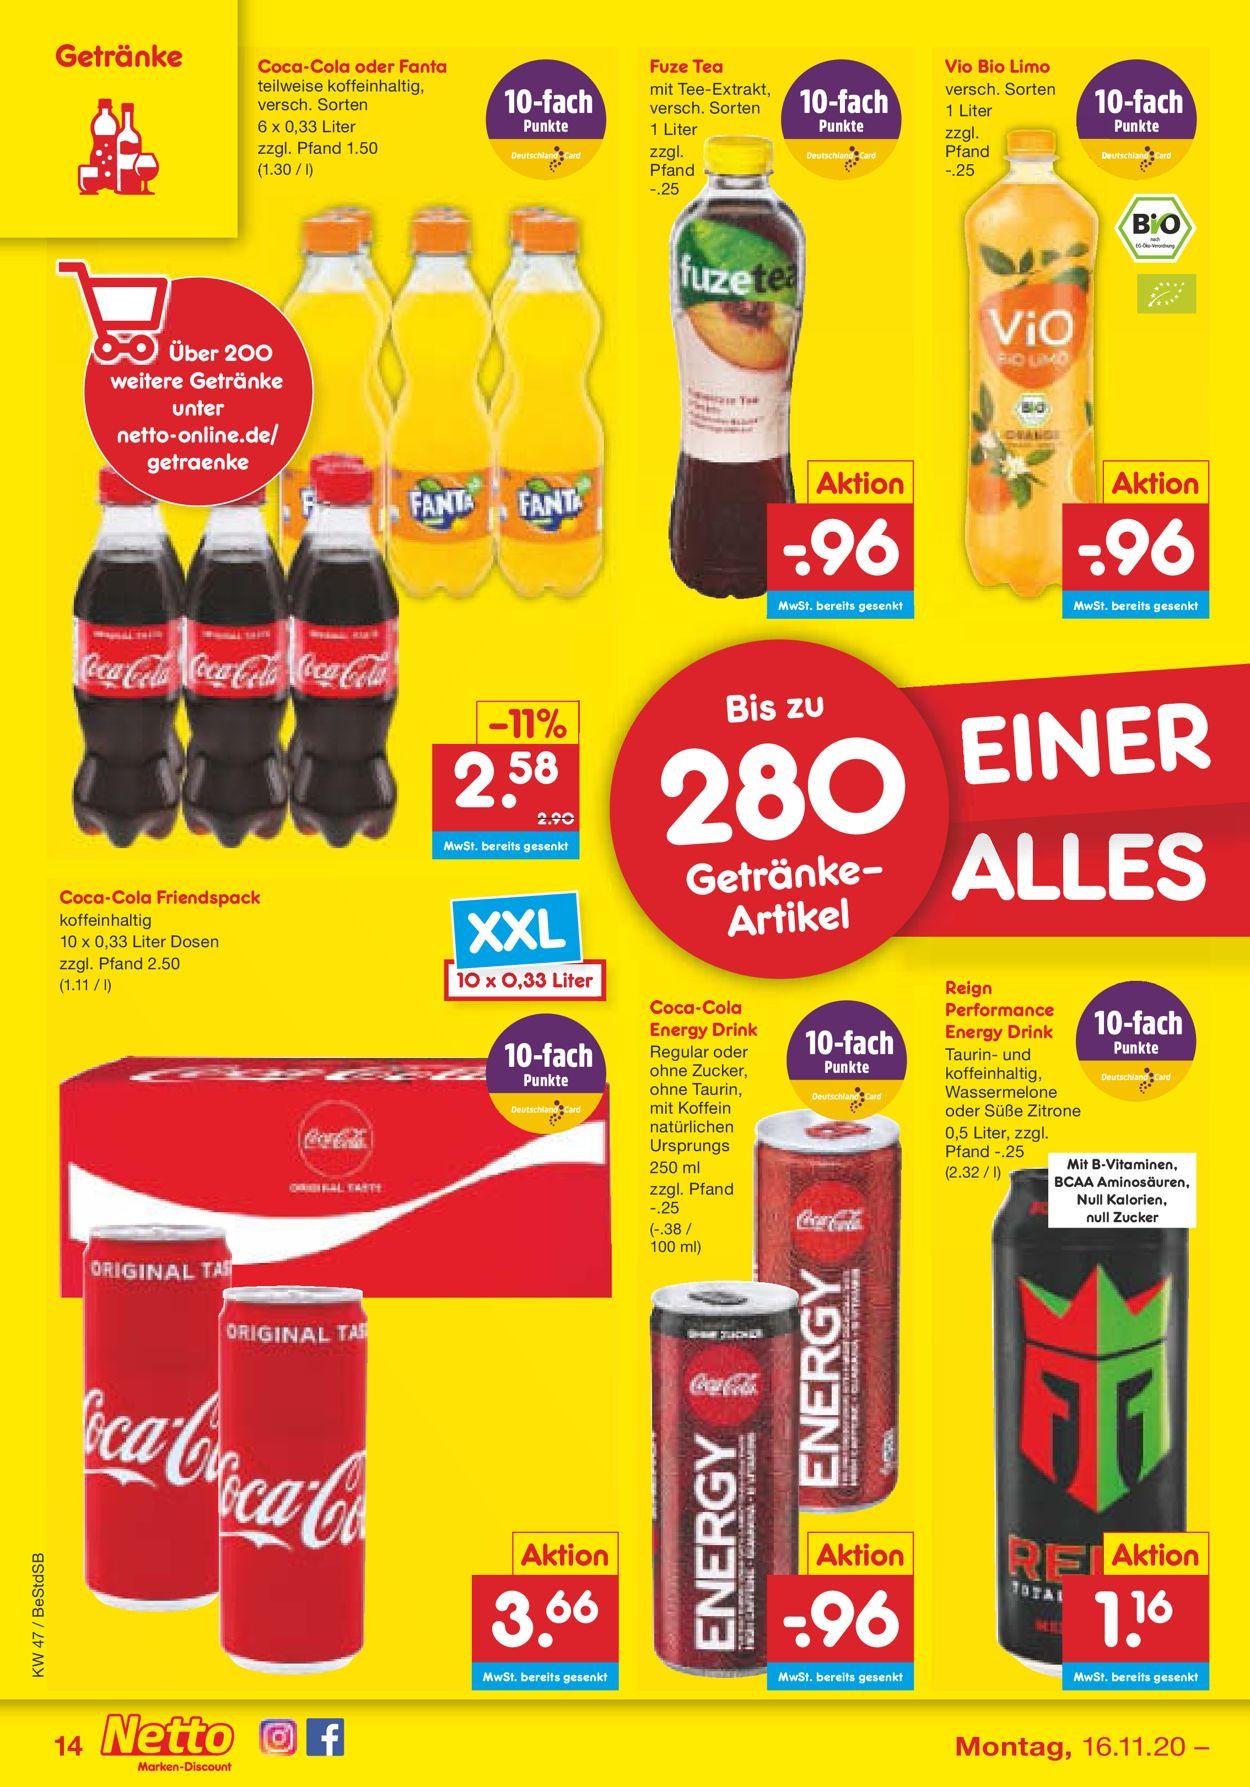 Netto Marken Discount Corona